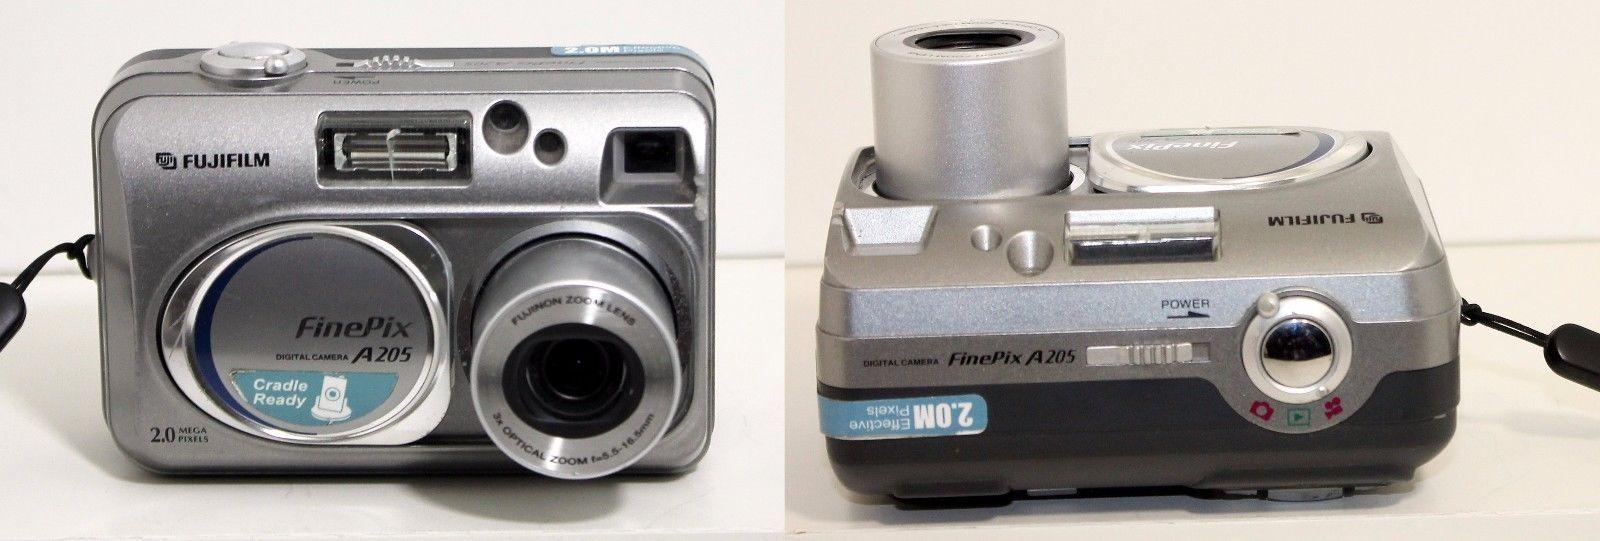 Fujifilm FinePix A Series A205 2.0 MP Digital Camera 3x Optical Zoom Silver